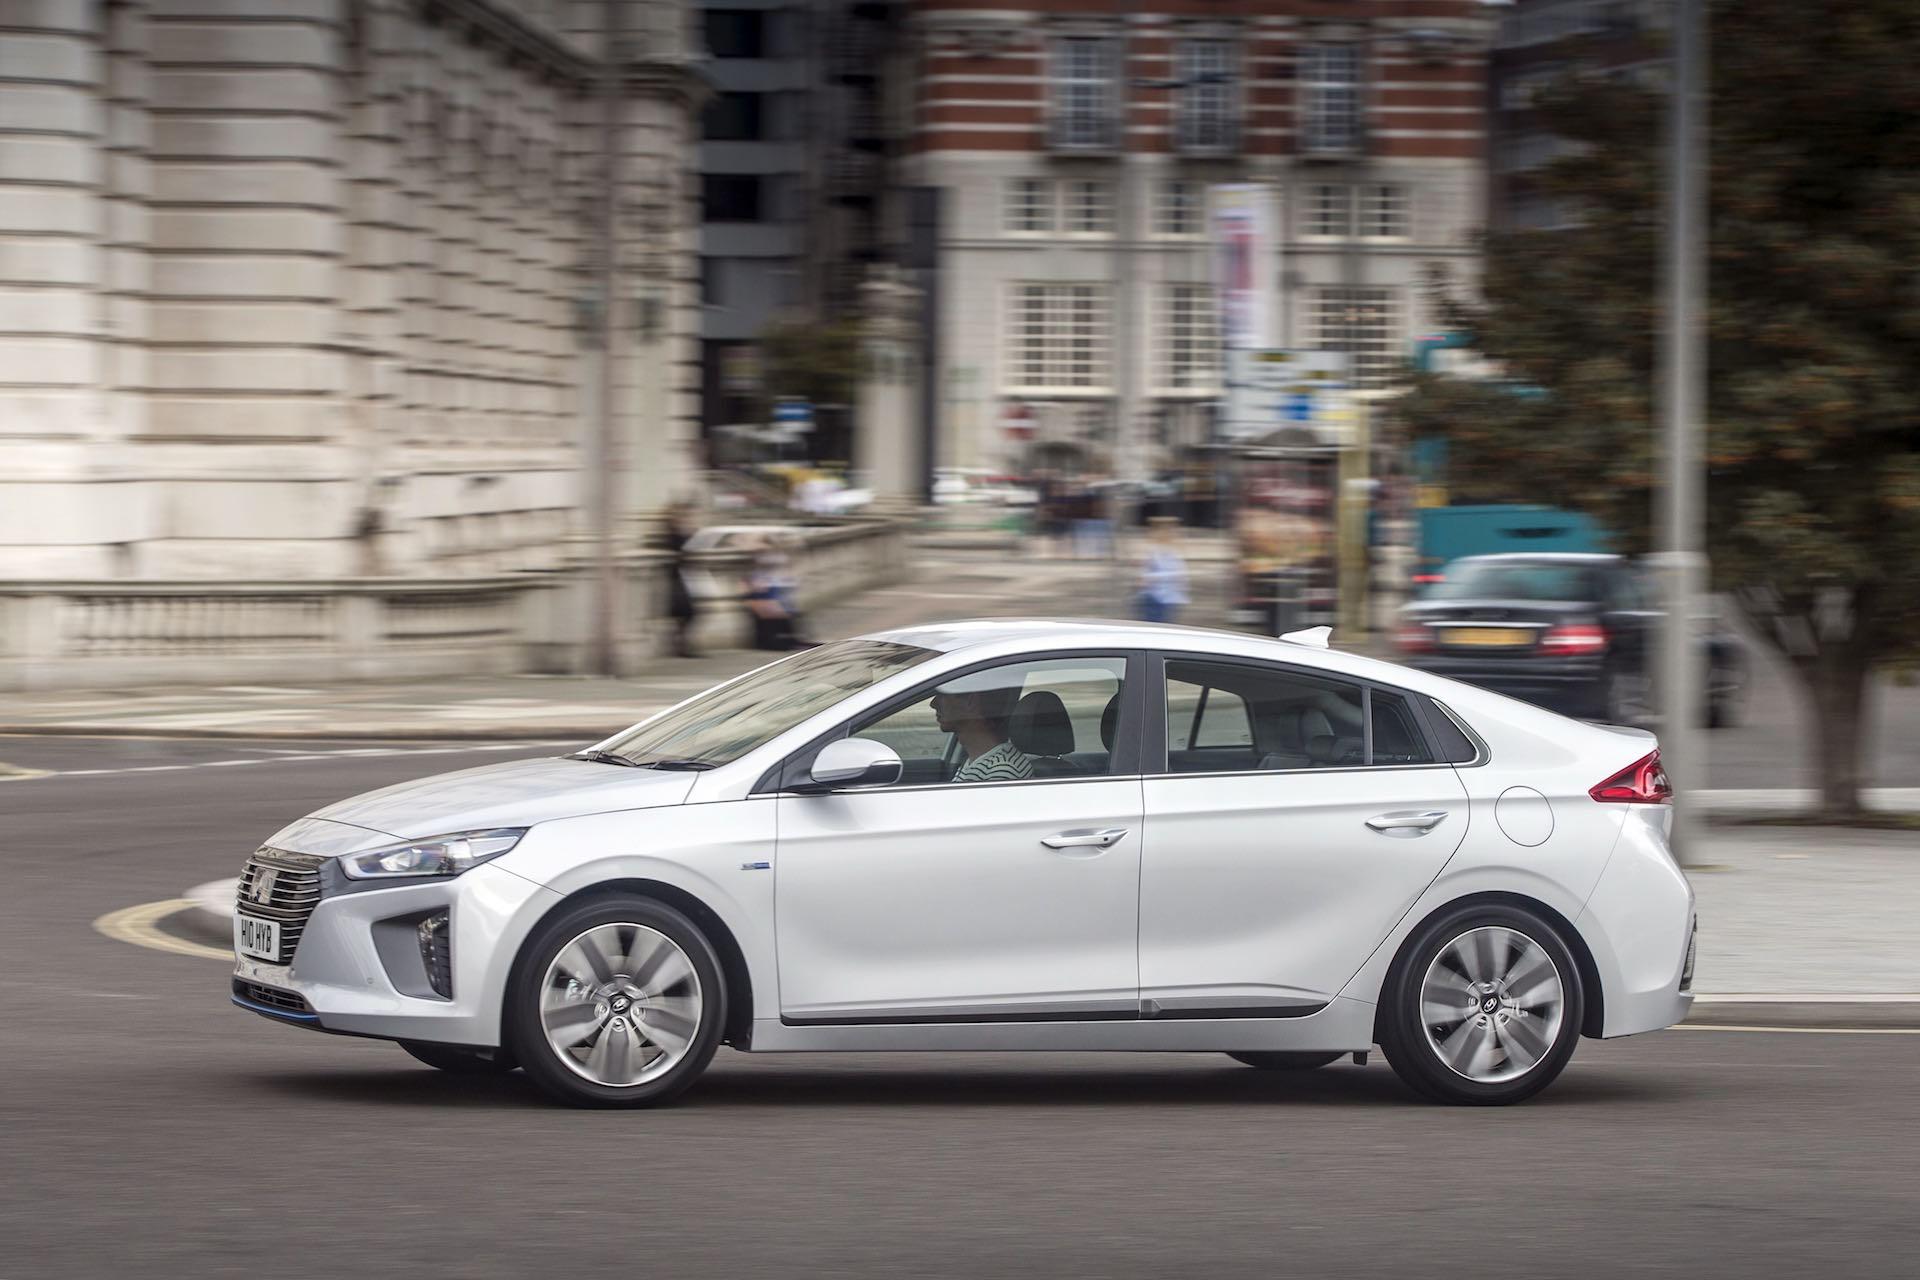 Hyundai Ioniq hybrid on the streets of London